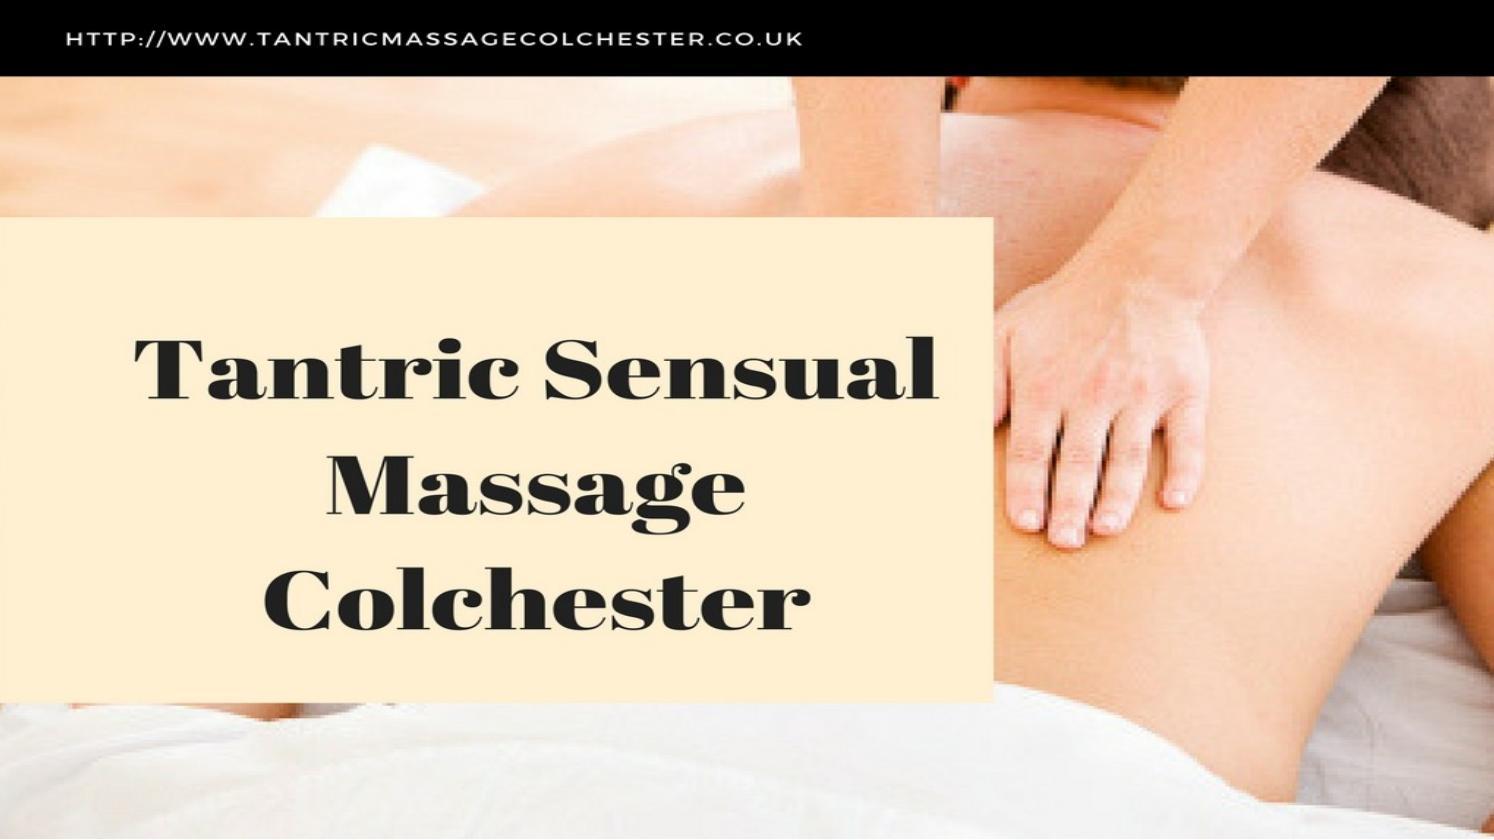 Prostate massage colchester by Tantricmassage - Issuu